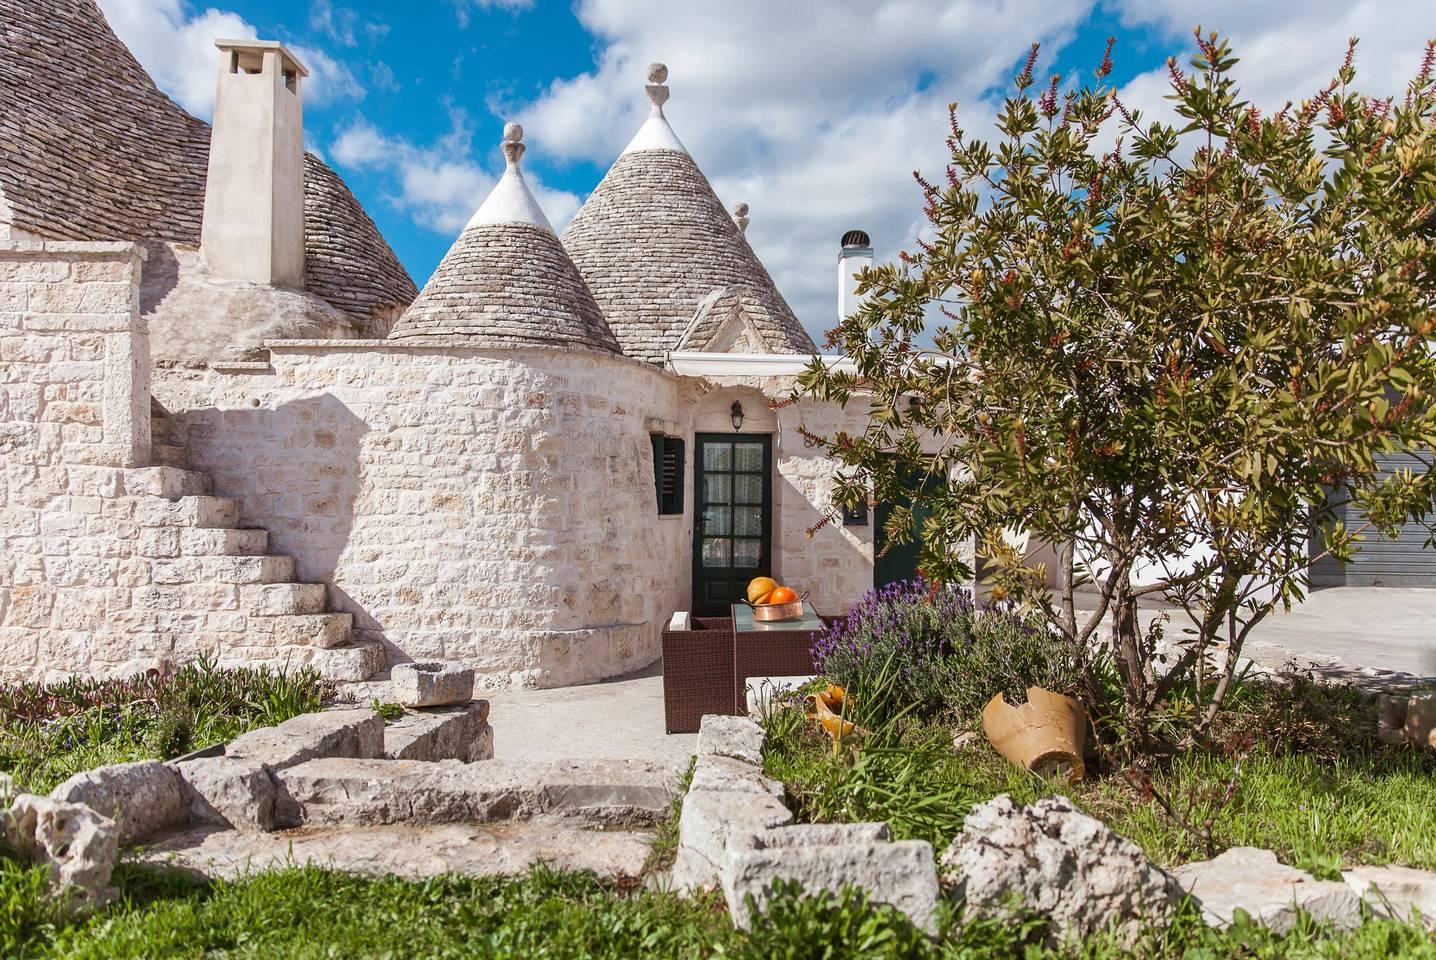 2/Little stone castle in Italy